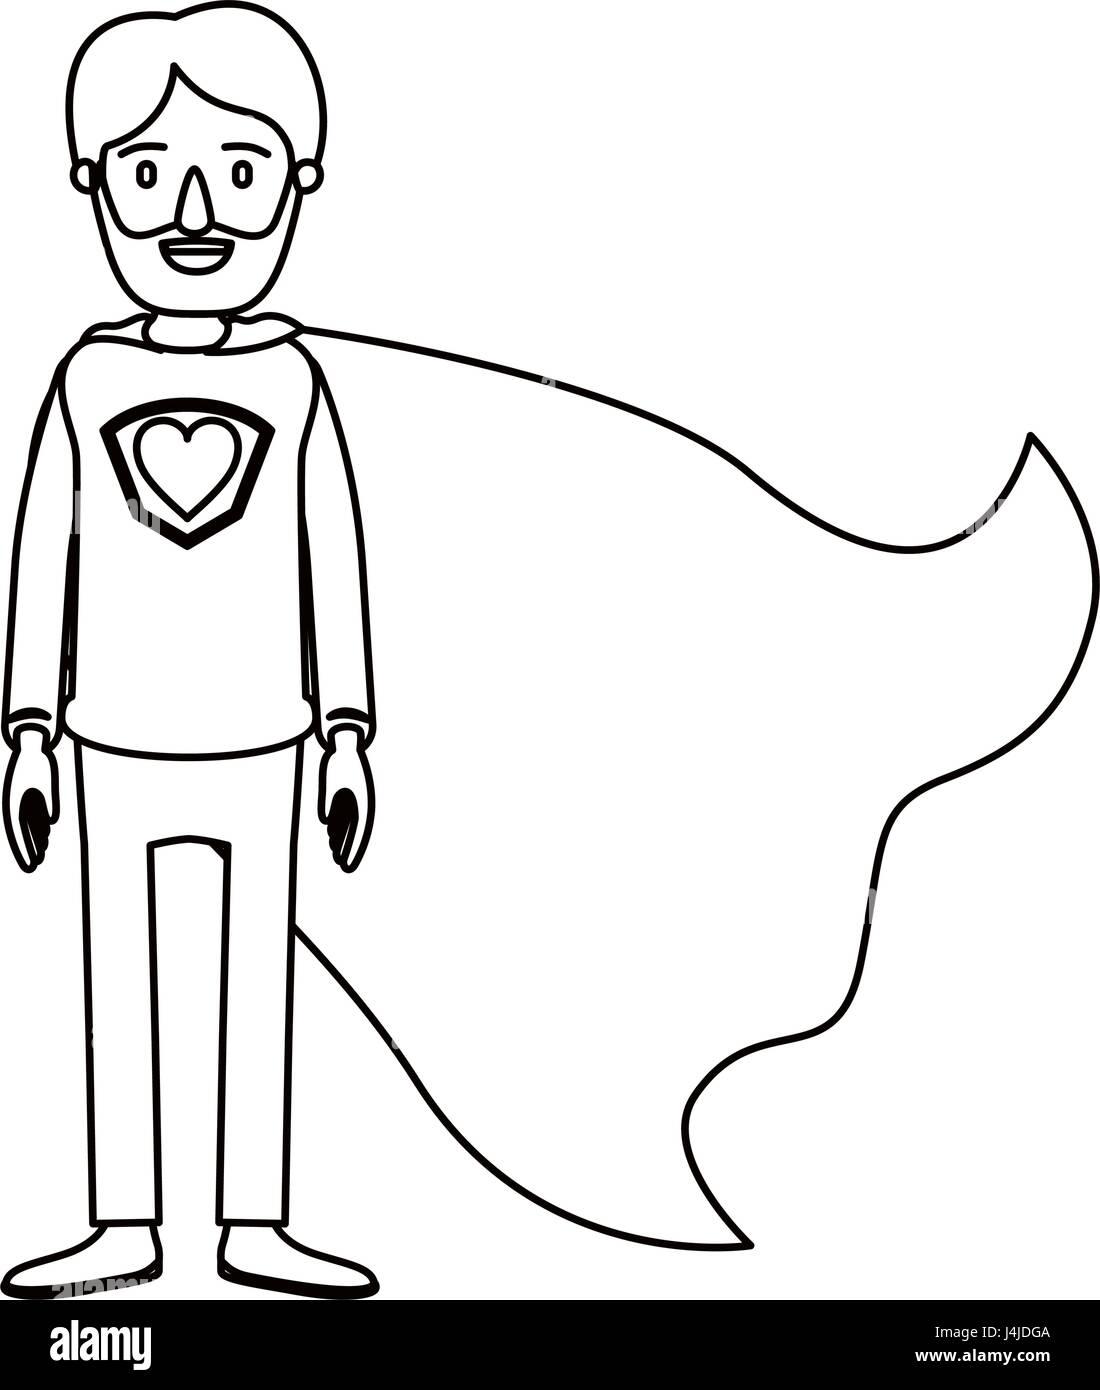 Silhouette Cartoon Full Body Super Dad Hero With Beard And Heart